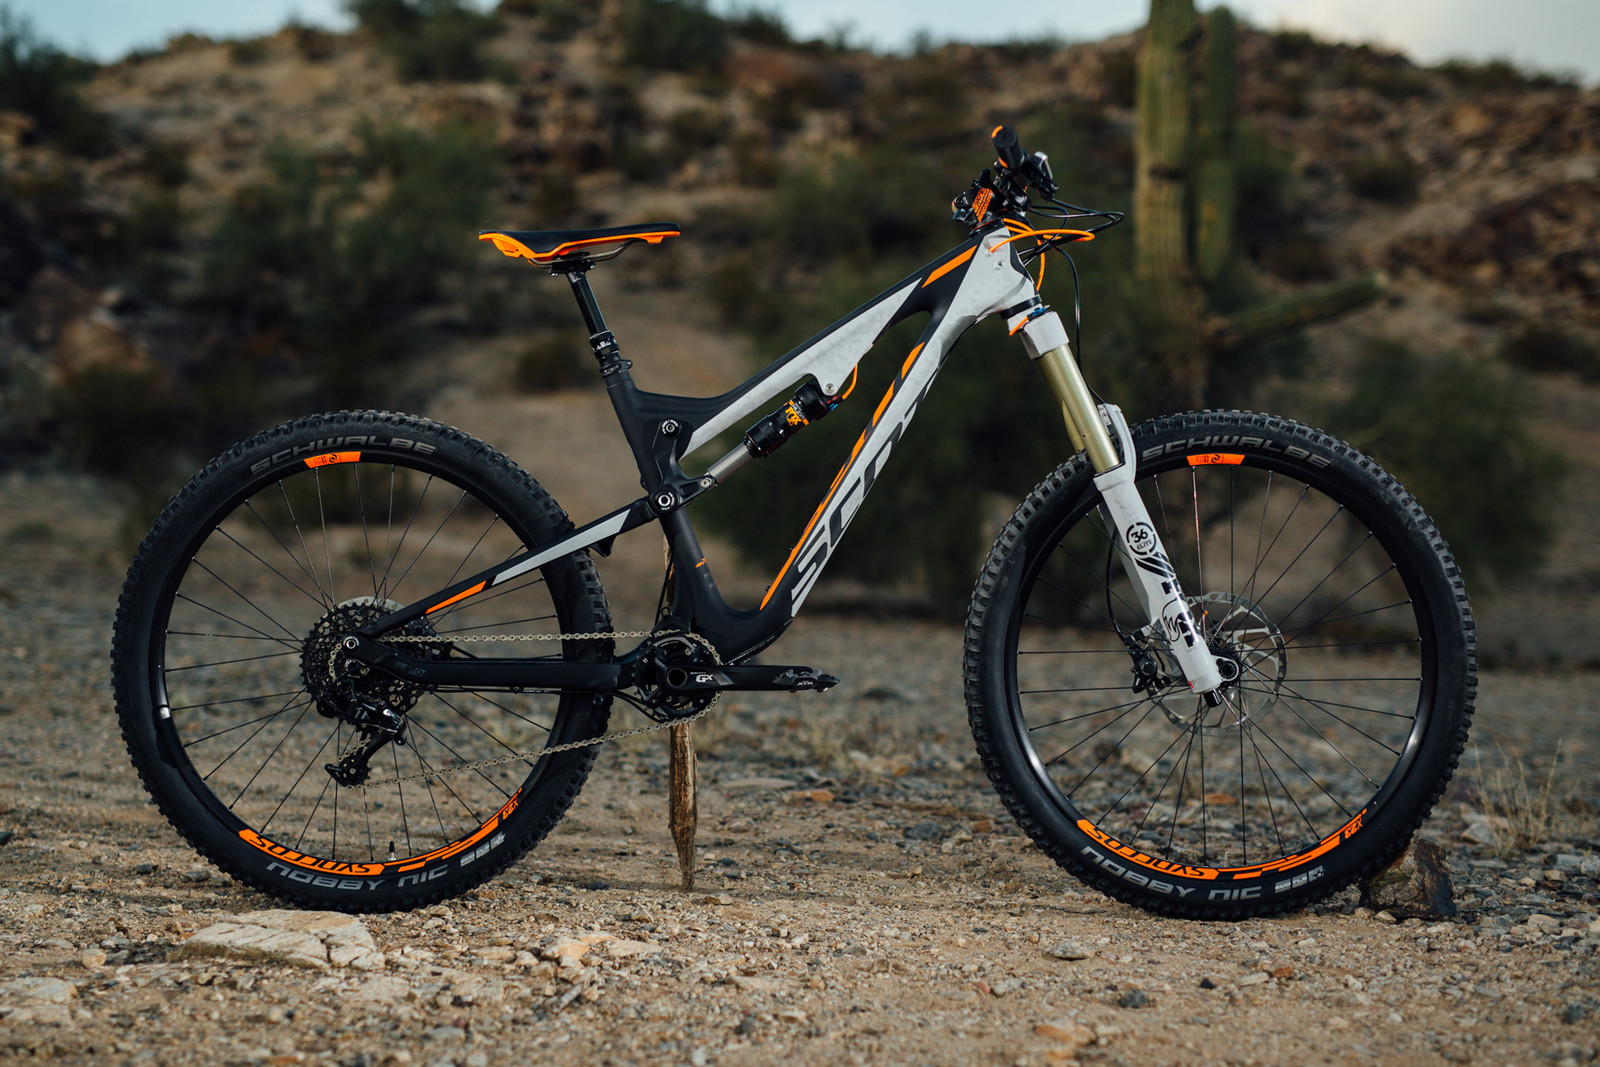 2016 Scott Genius LT 710 - 17 Bikes Tested - 2016 Vital MTB Test Sessions - Mountain Biking Pictures - Vital MTB